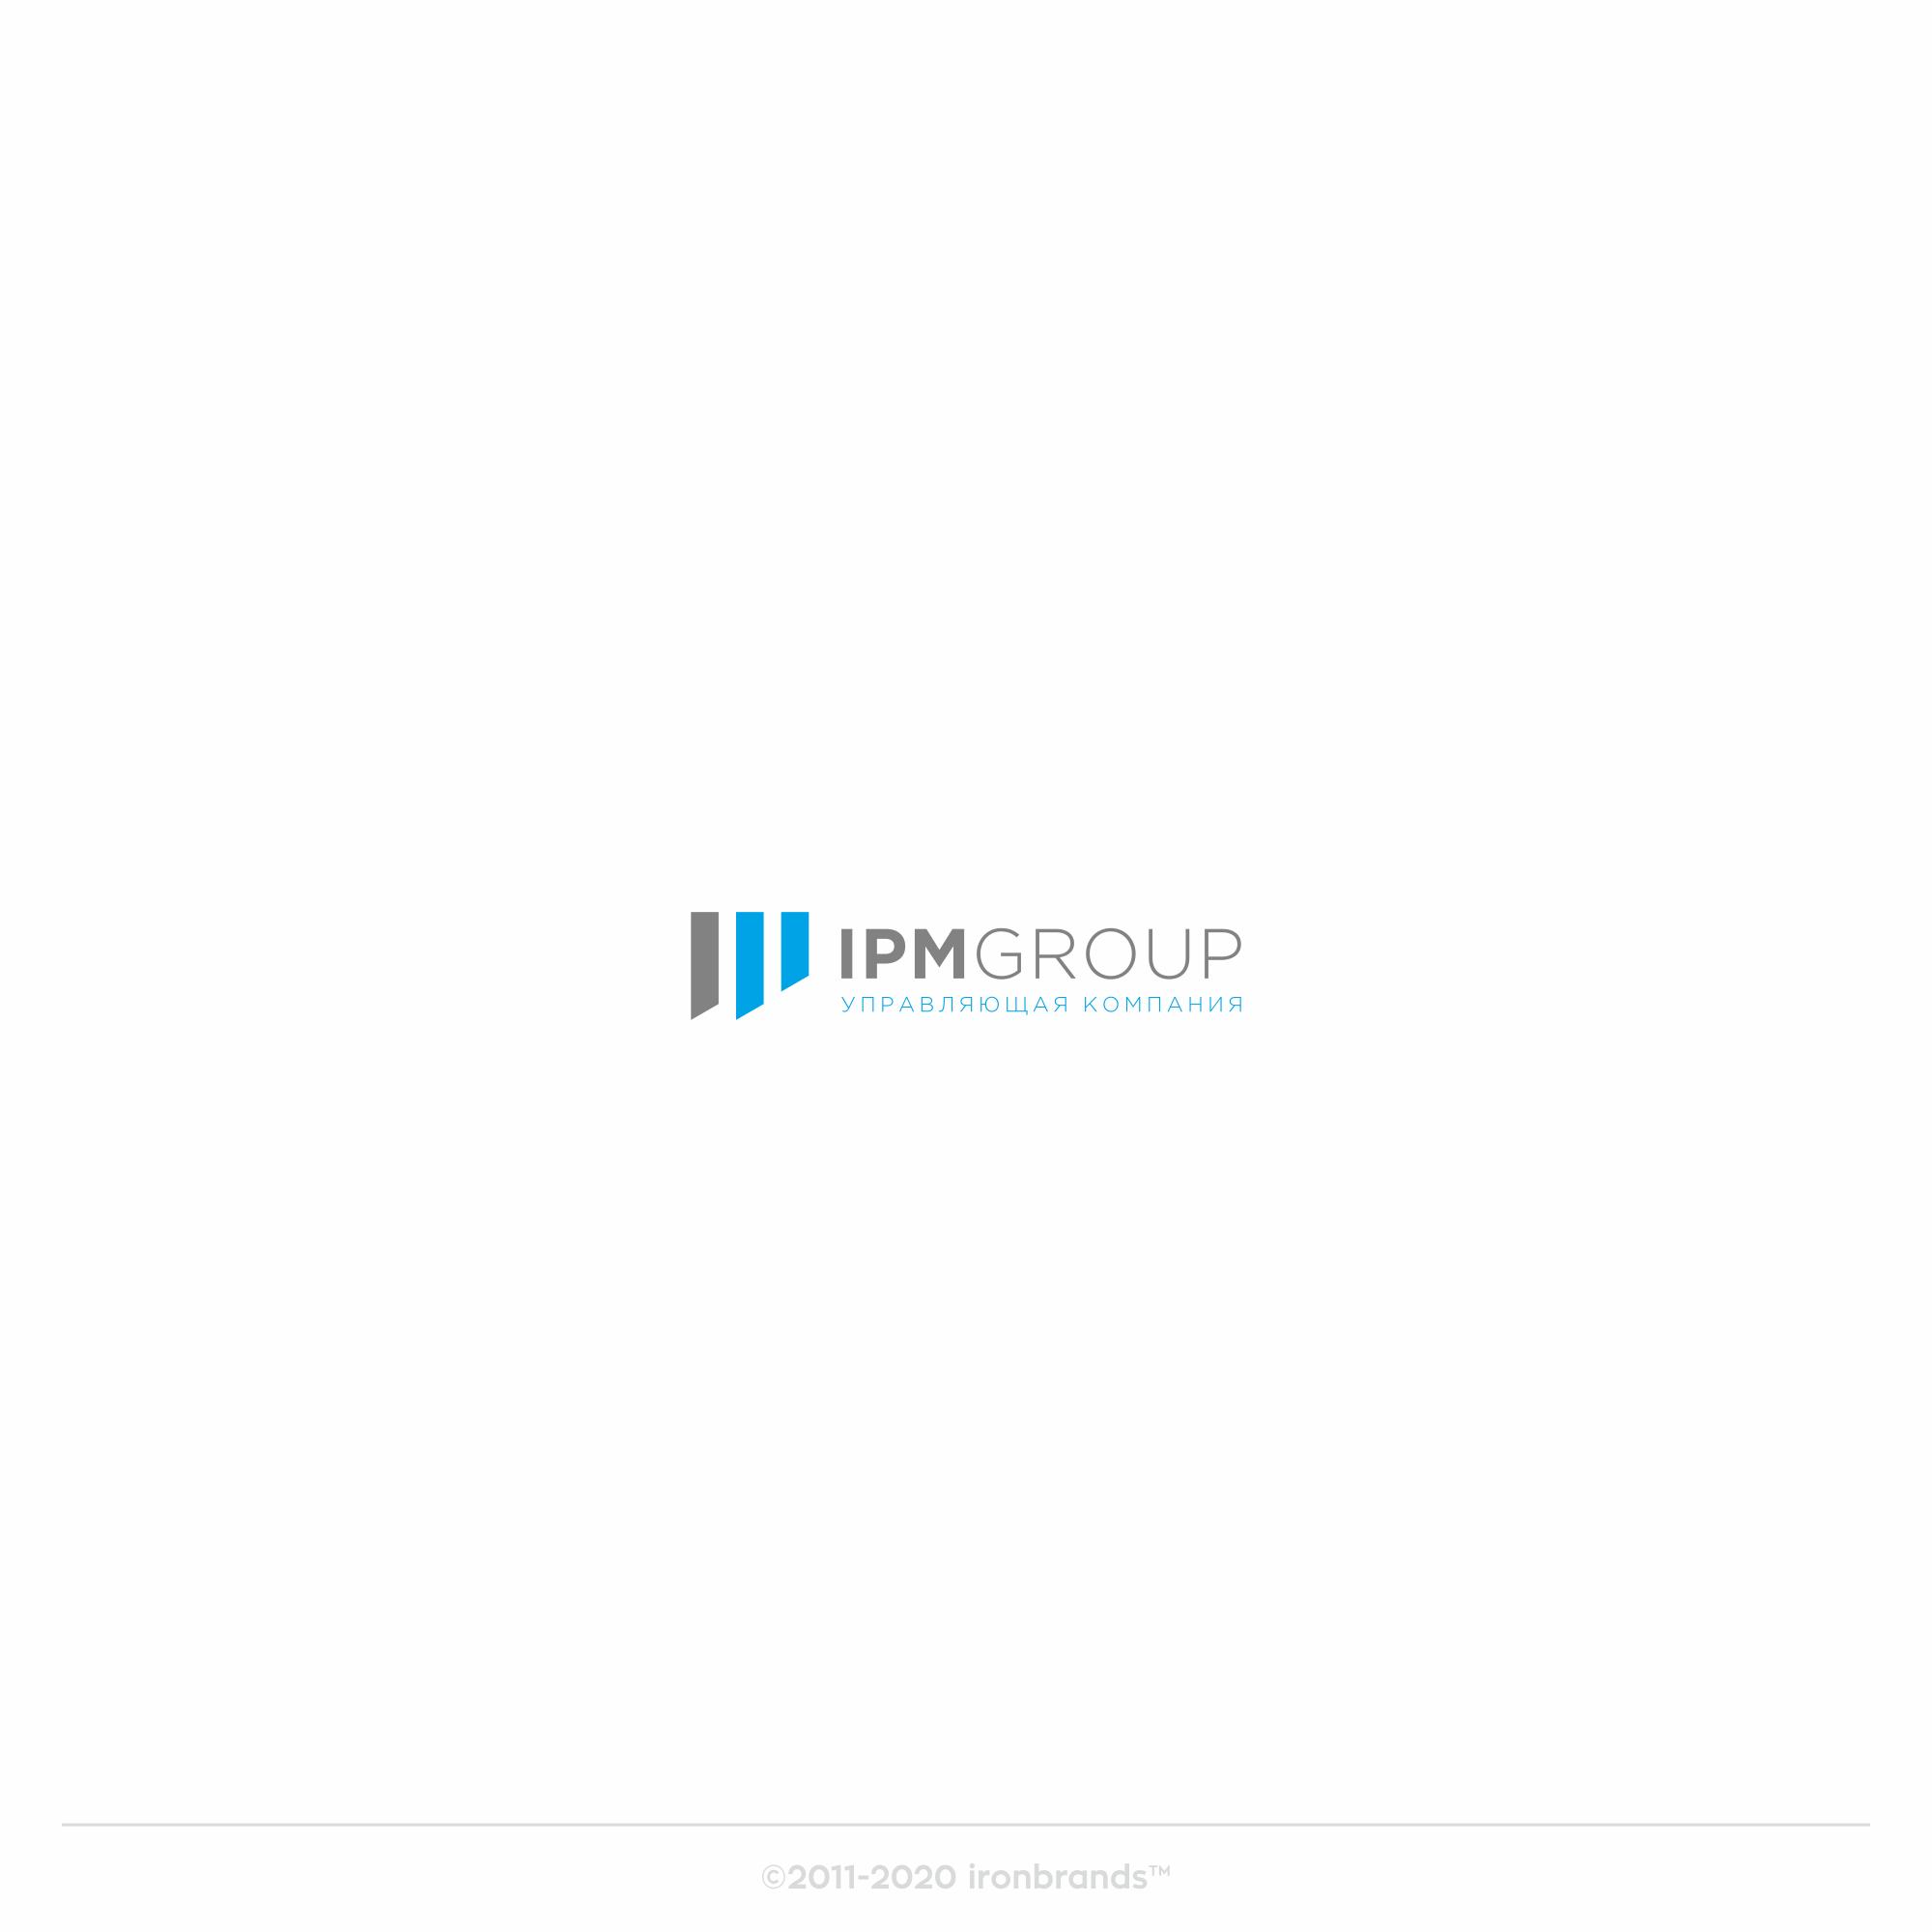 Разработка логотипа для управляющей компании фото f_0775f834b2c81847.jpg